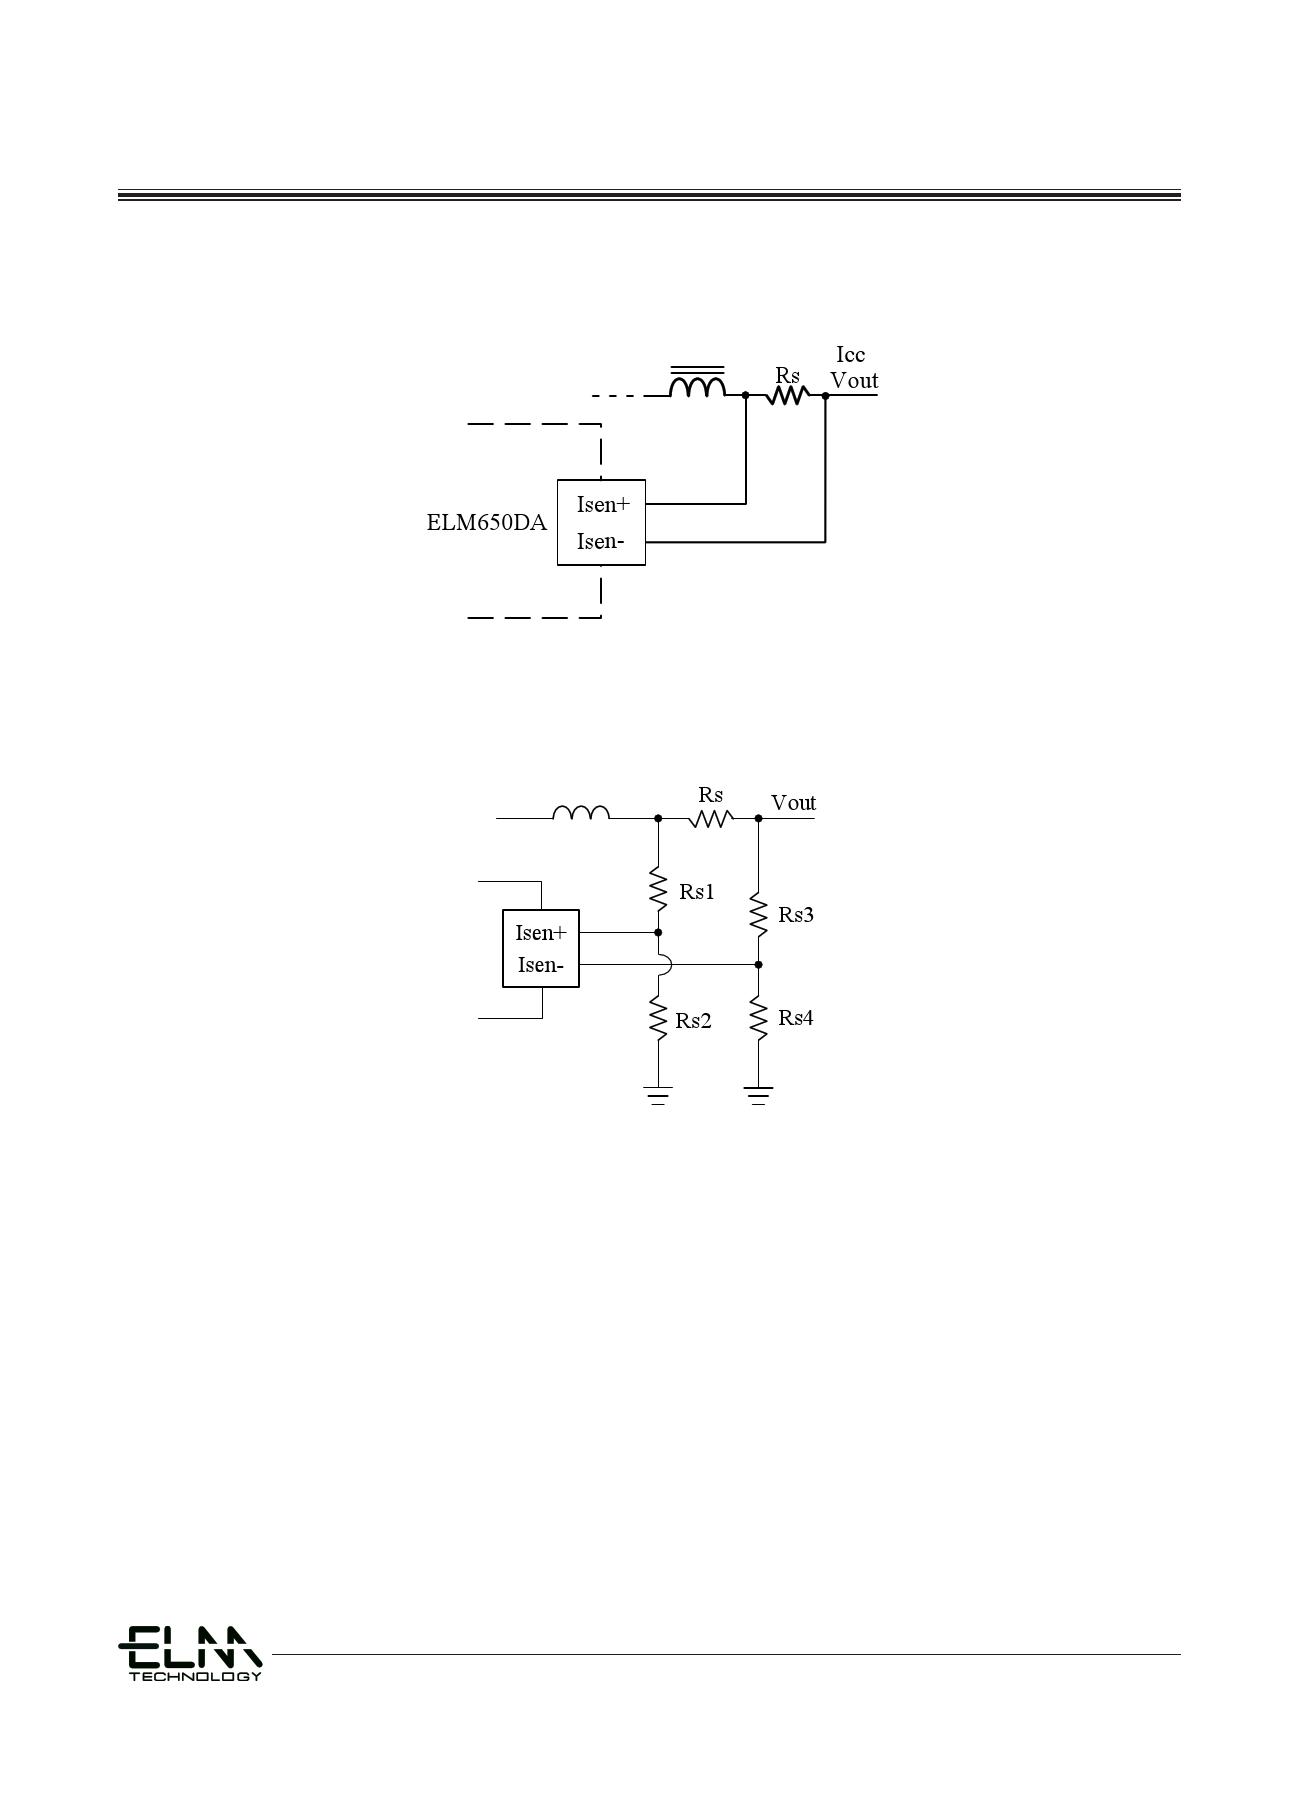 ELM650DA 電子部品, 半導体